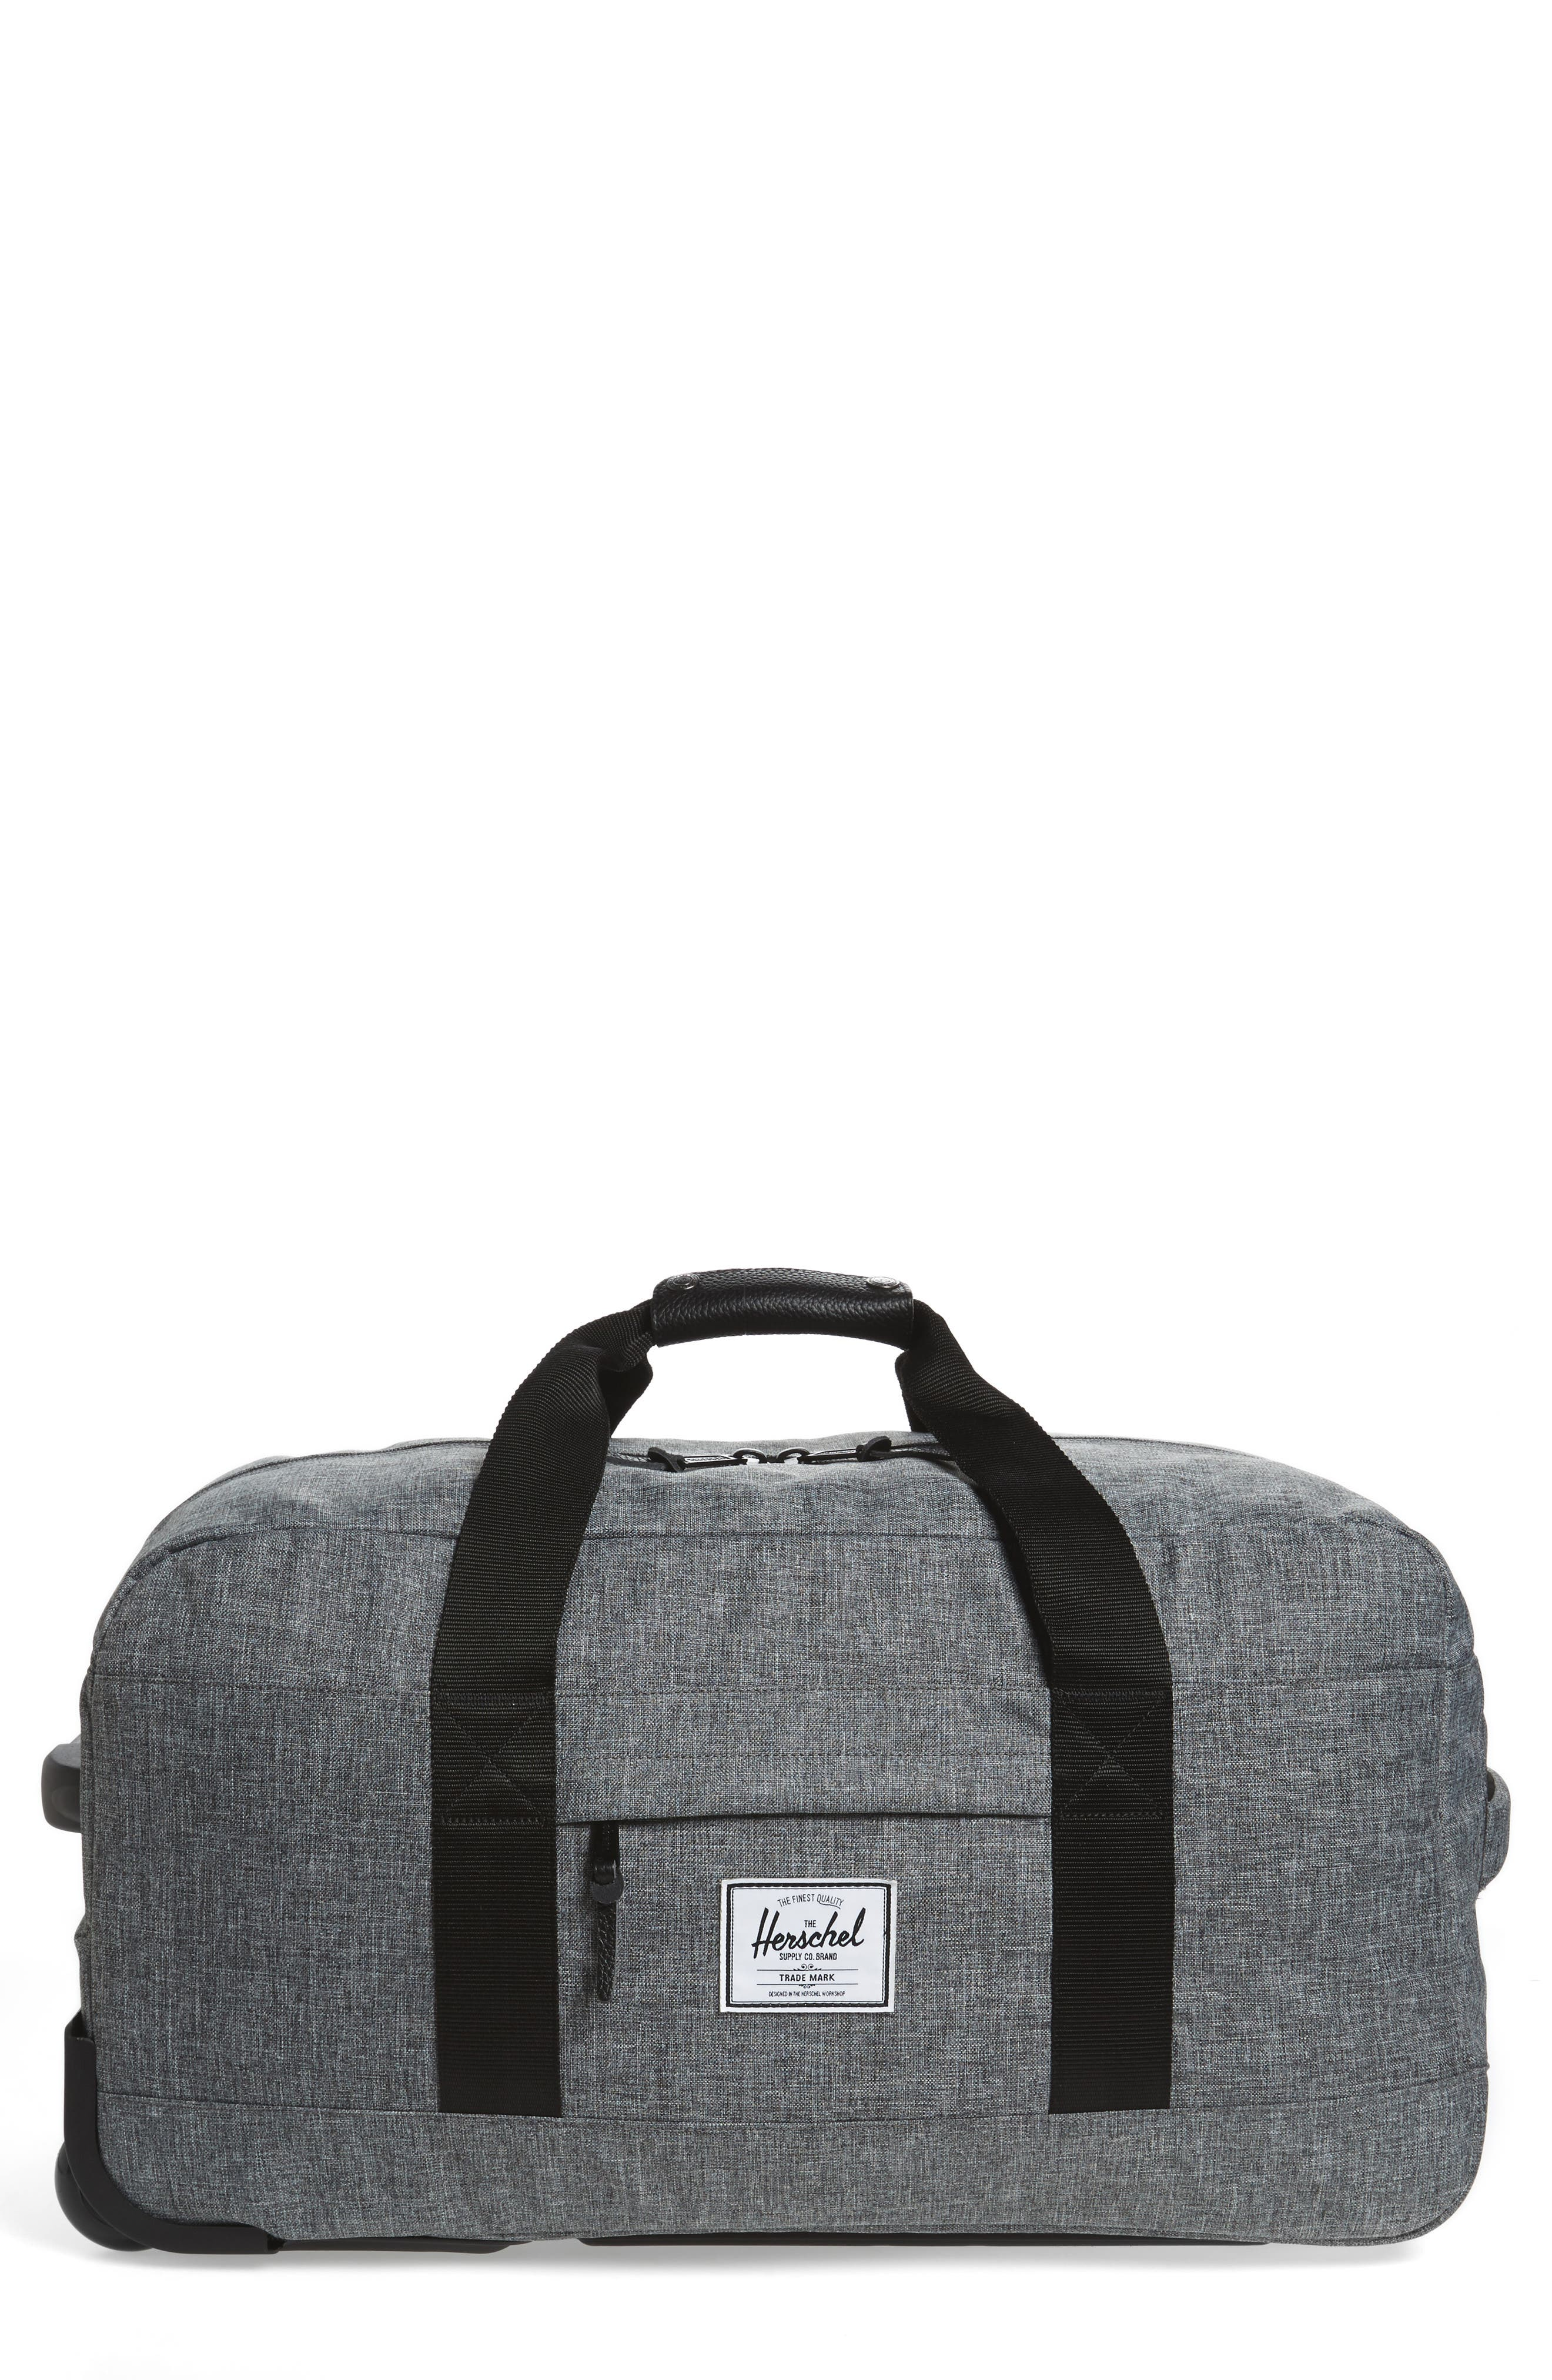 HERSCHEL SUPPLY CO. Wheelie Outfitter 24-Inch Duffel Bag, Main, color, 084